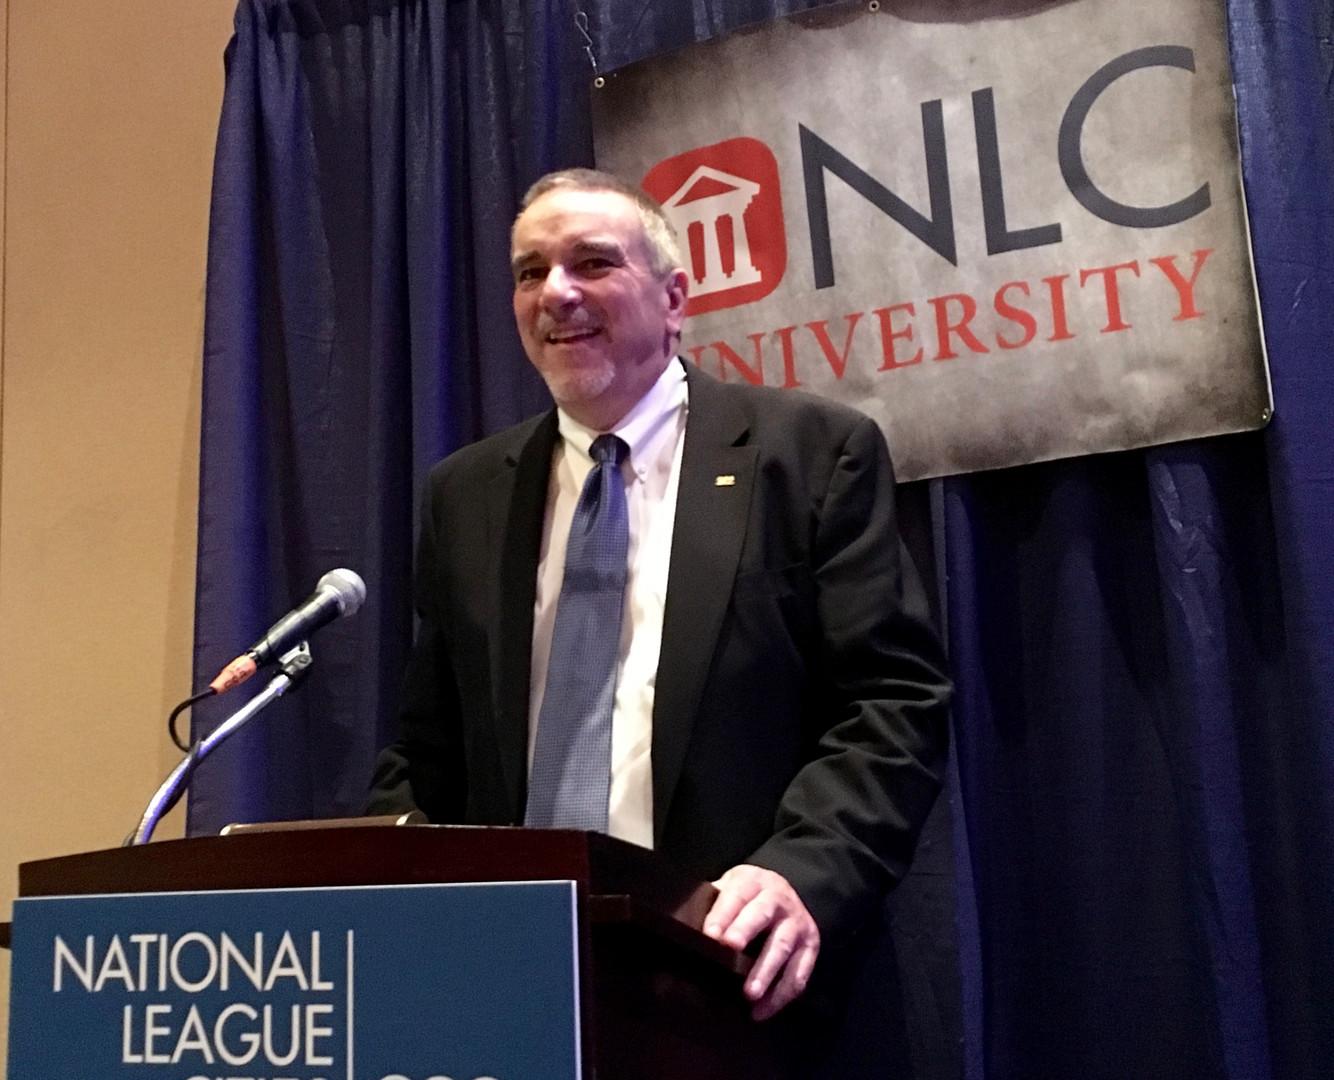 NLC University